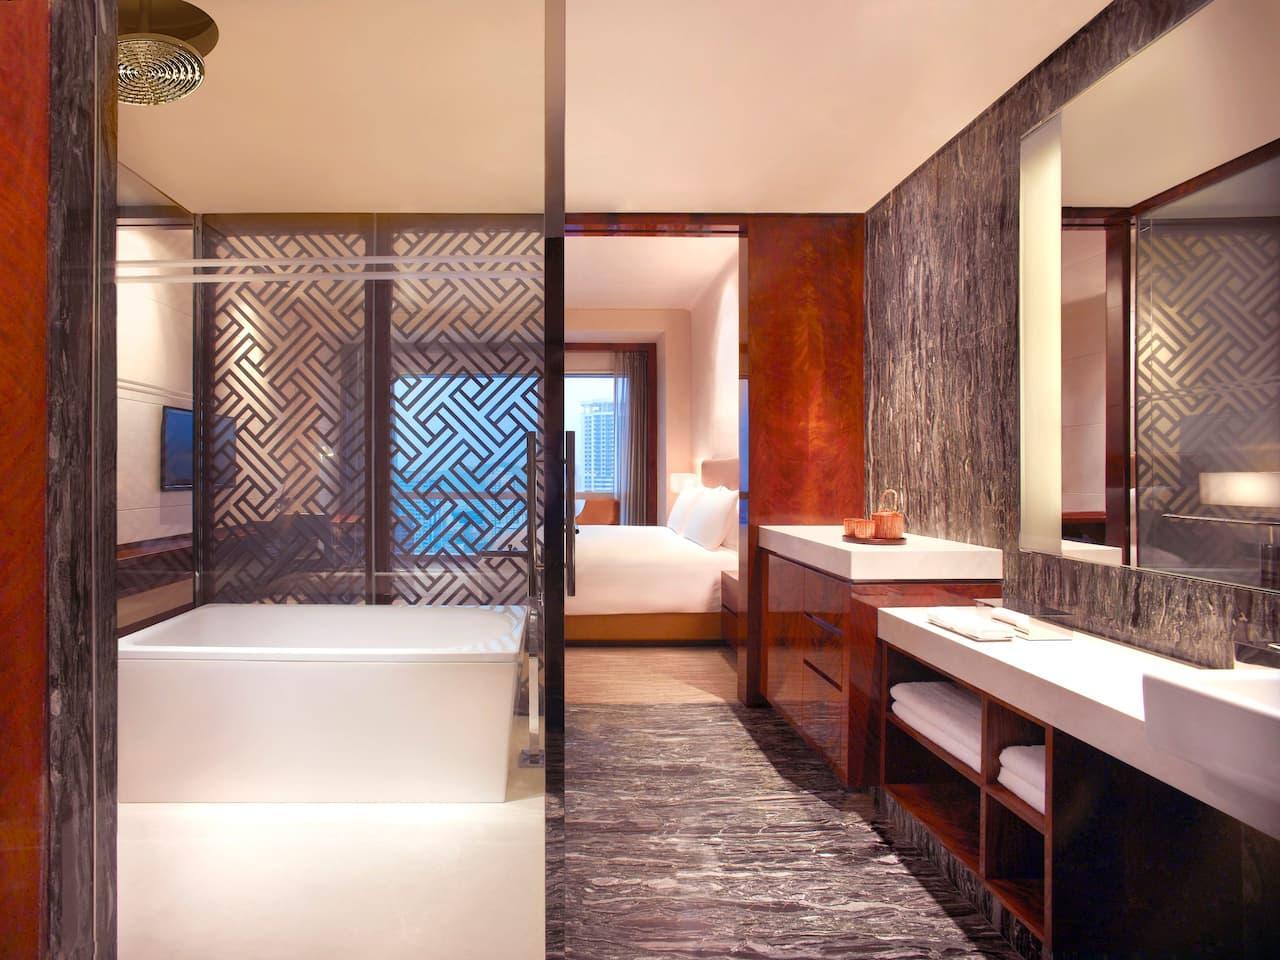 Grand Hyatt Shenzhen Bathroom